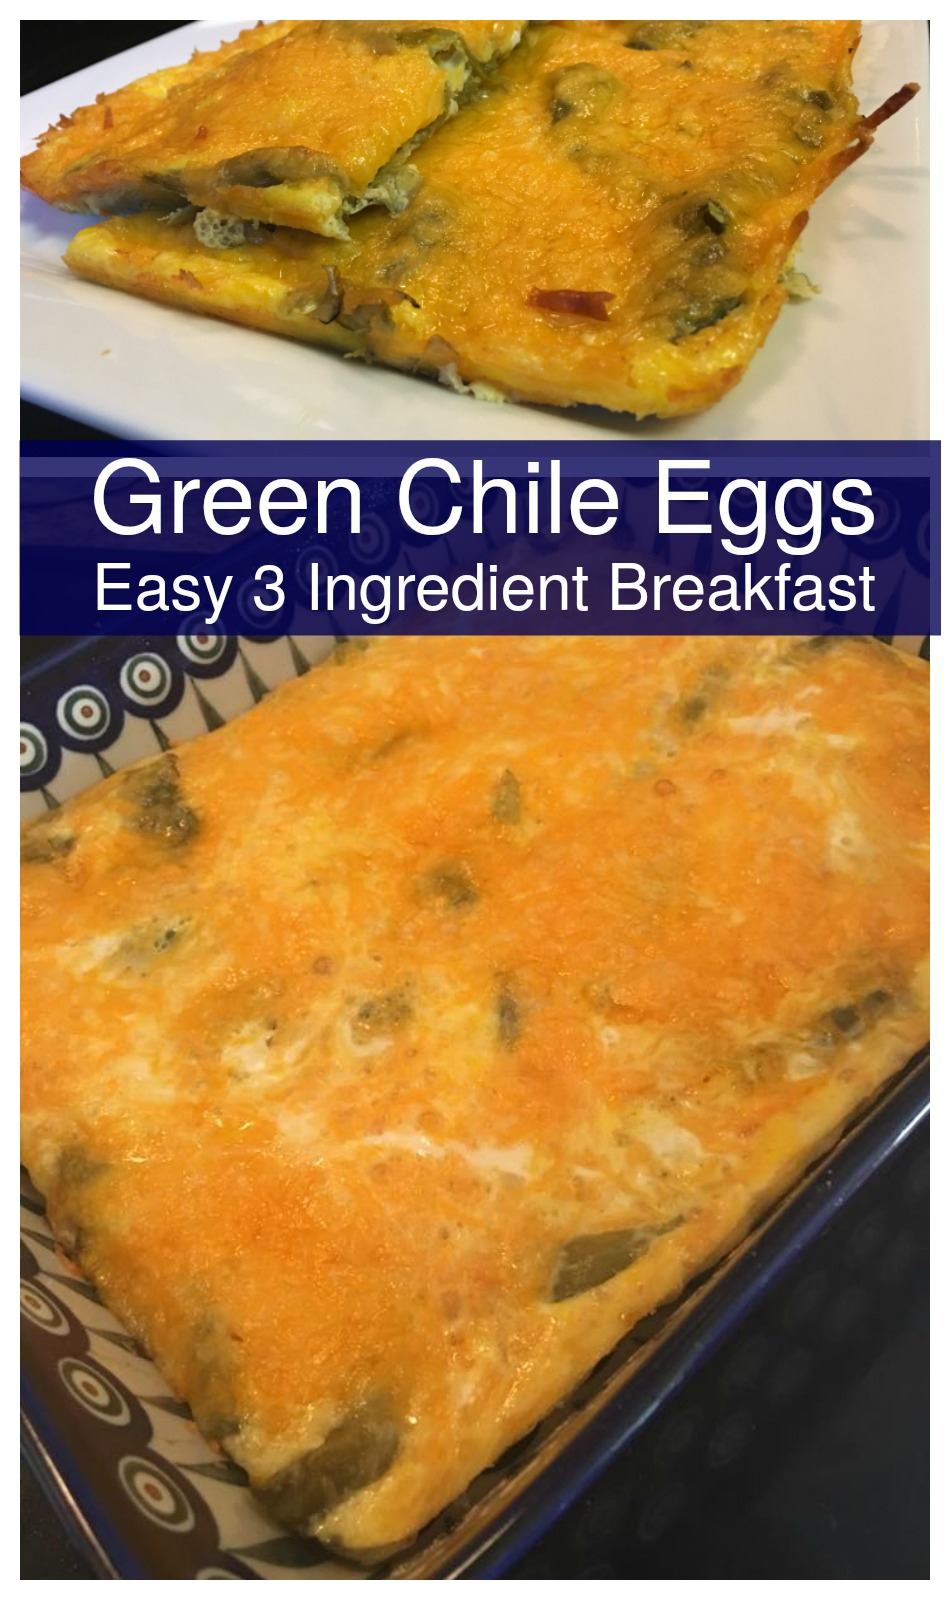 Green Chile Eggs, an easy breakfast!